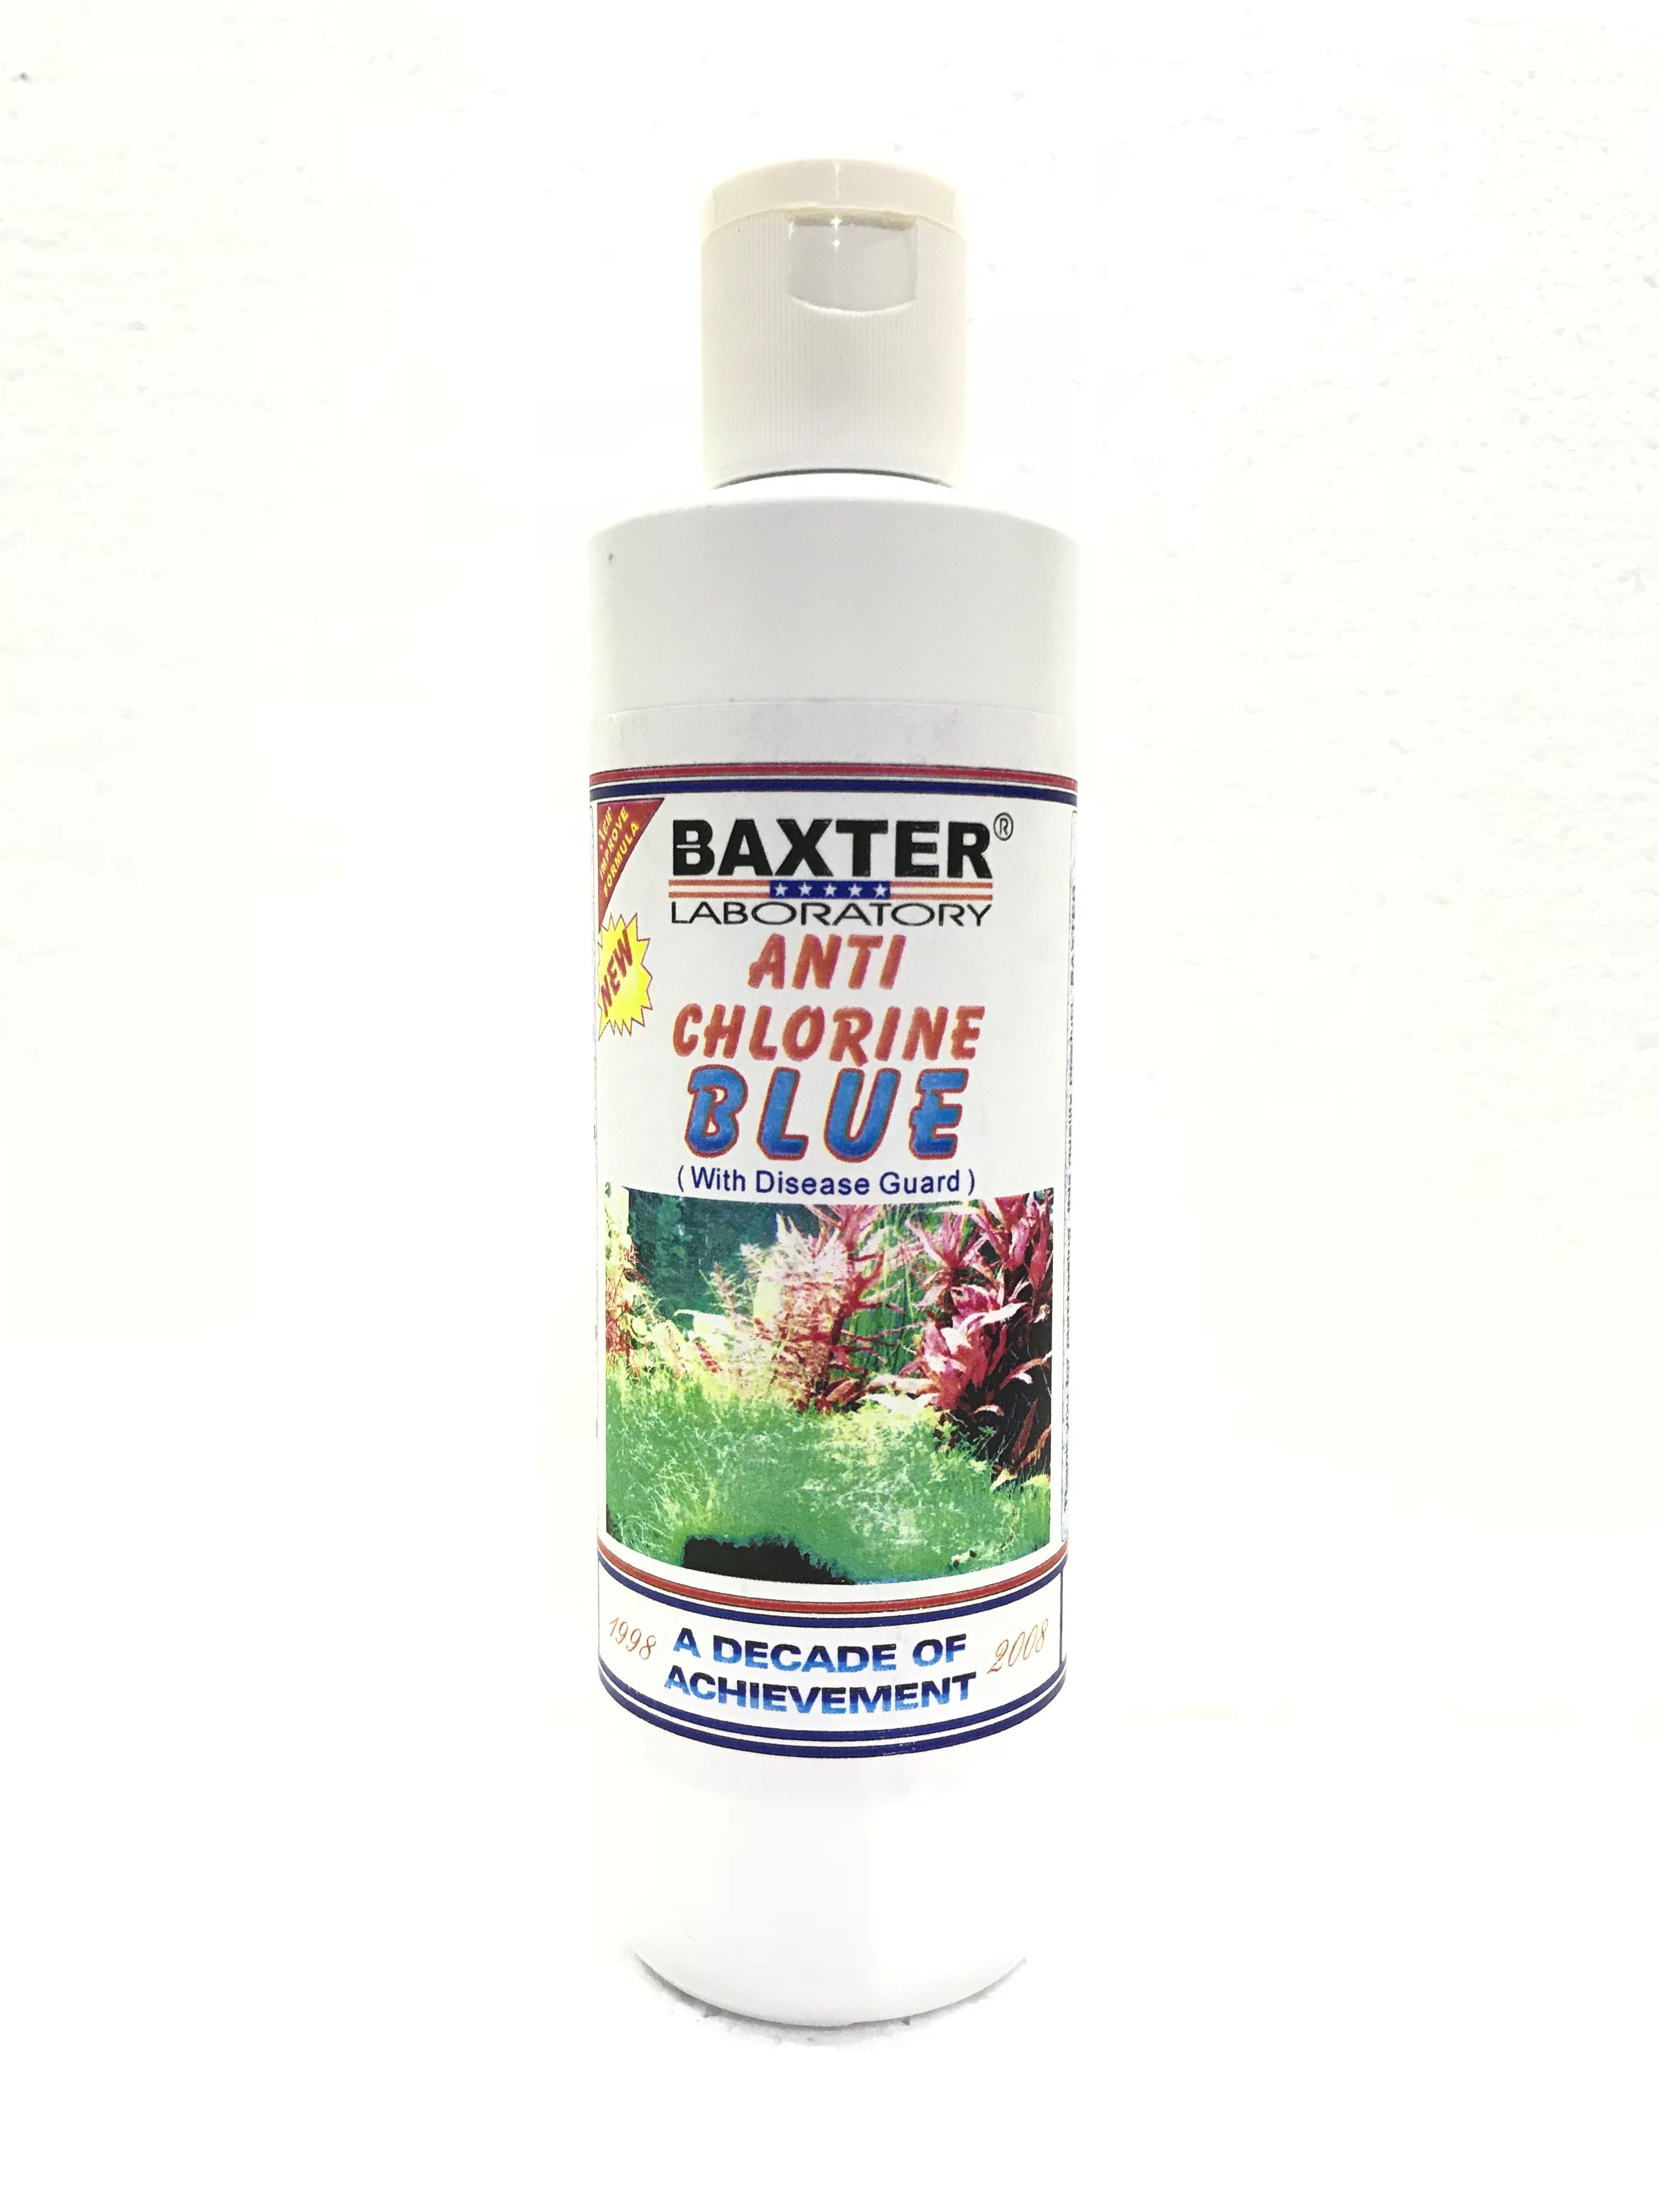 Baxter Anti-Chlorine Blue (With Disease Guard)